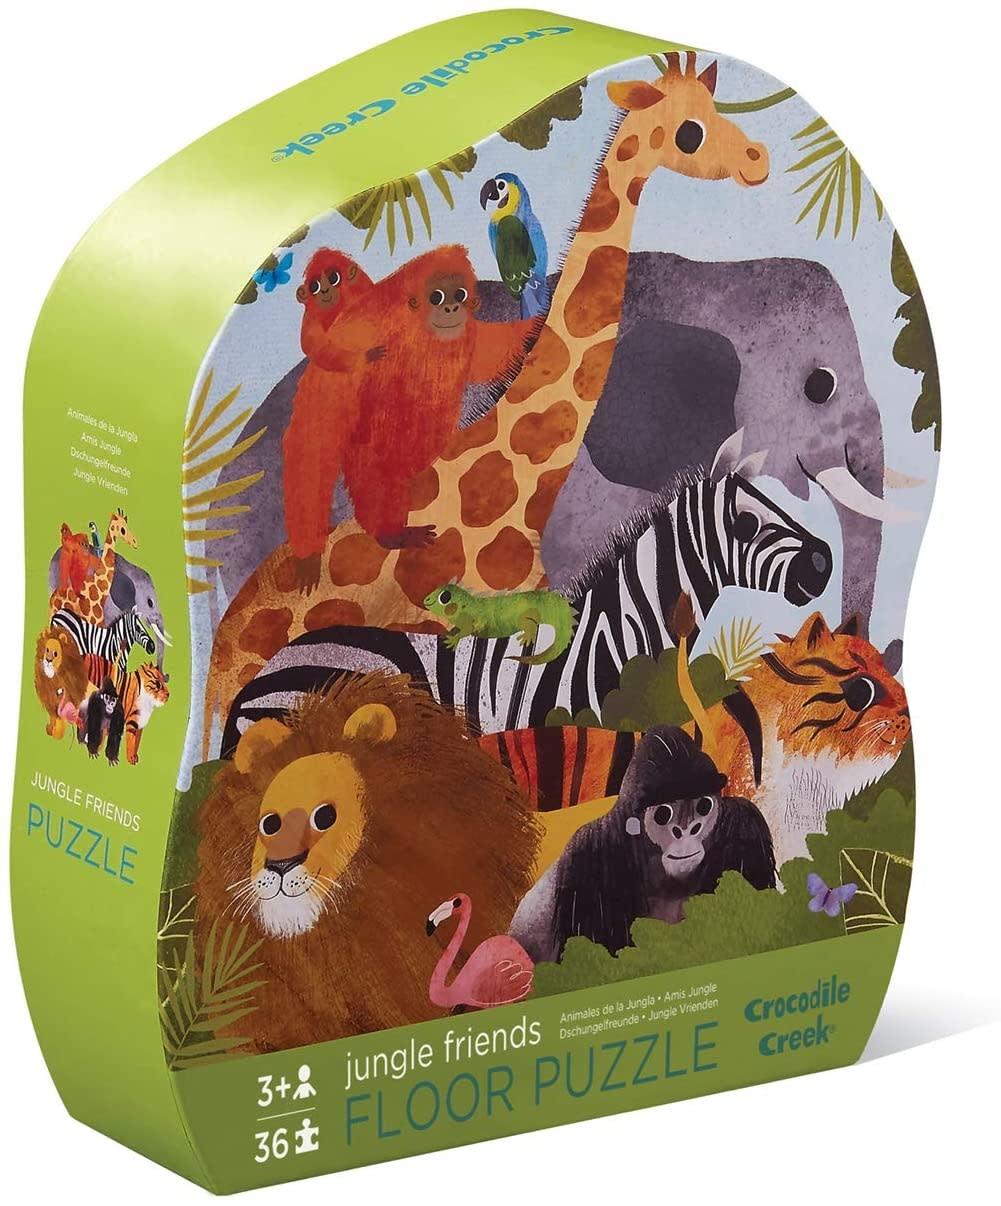 Jungle Friends 36-pc Puzzle by Crocodile Creek